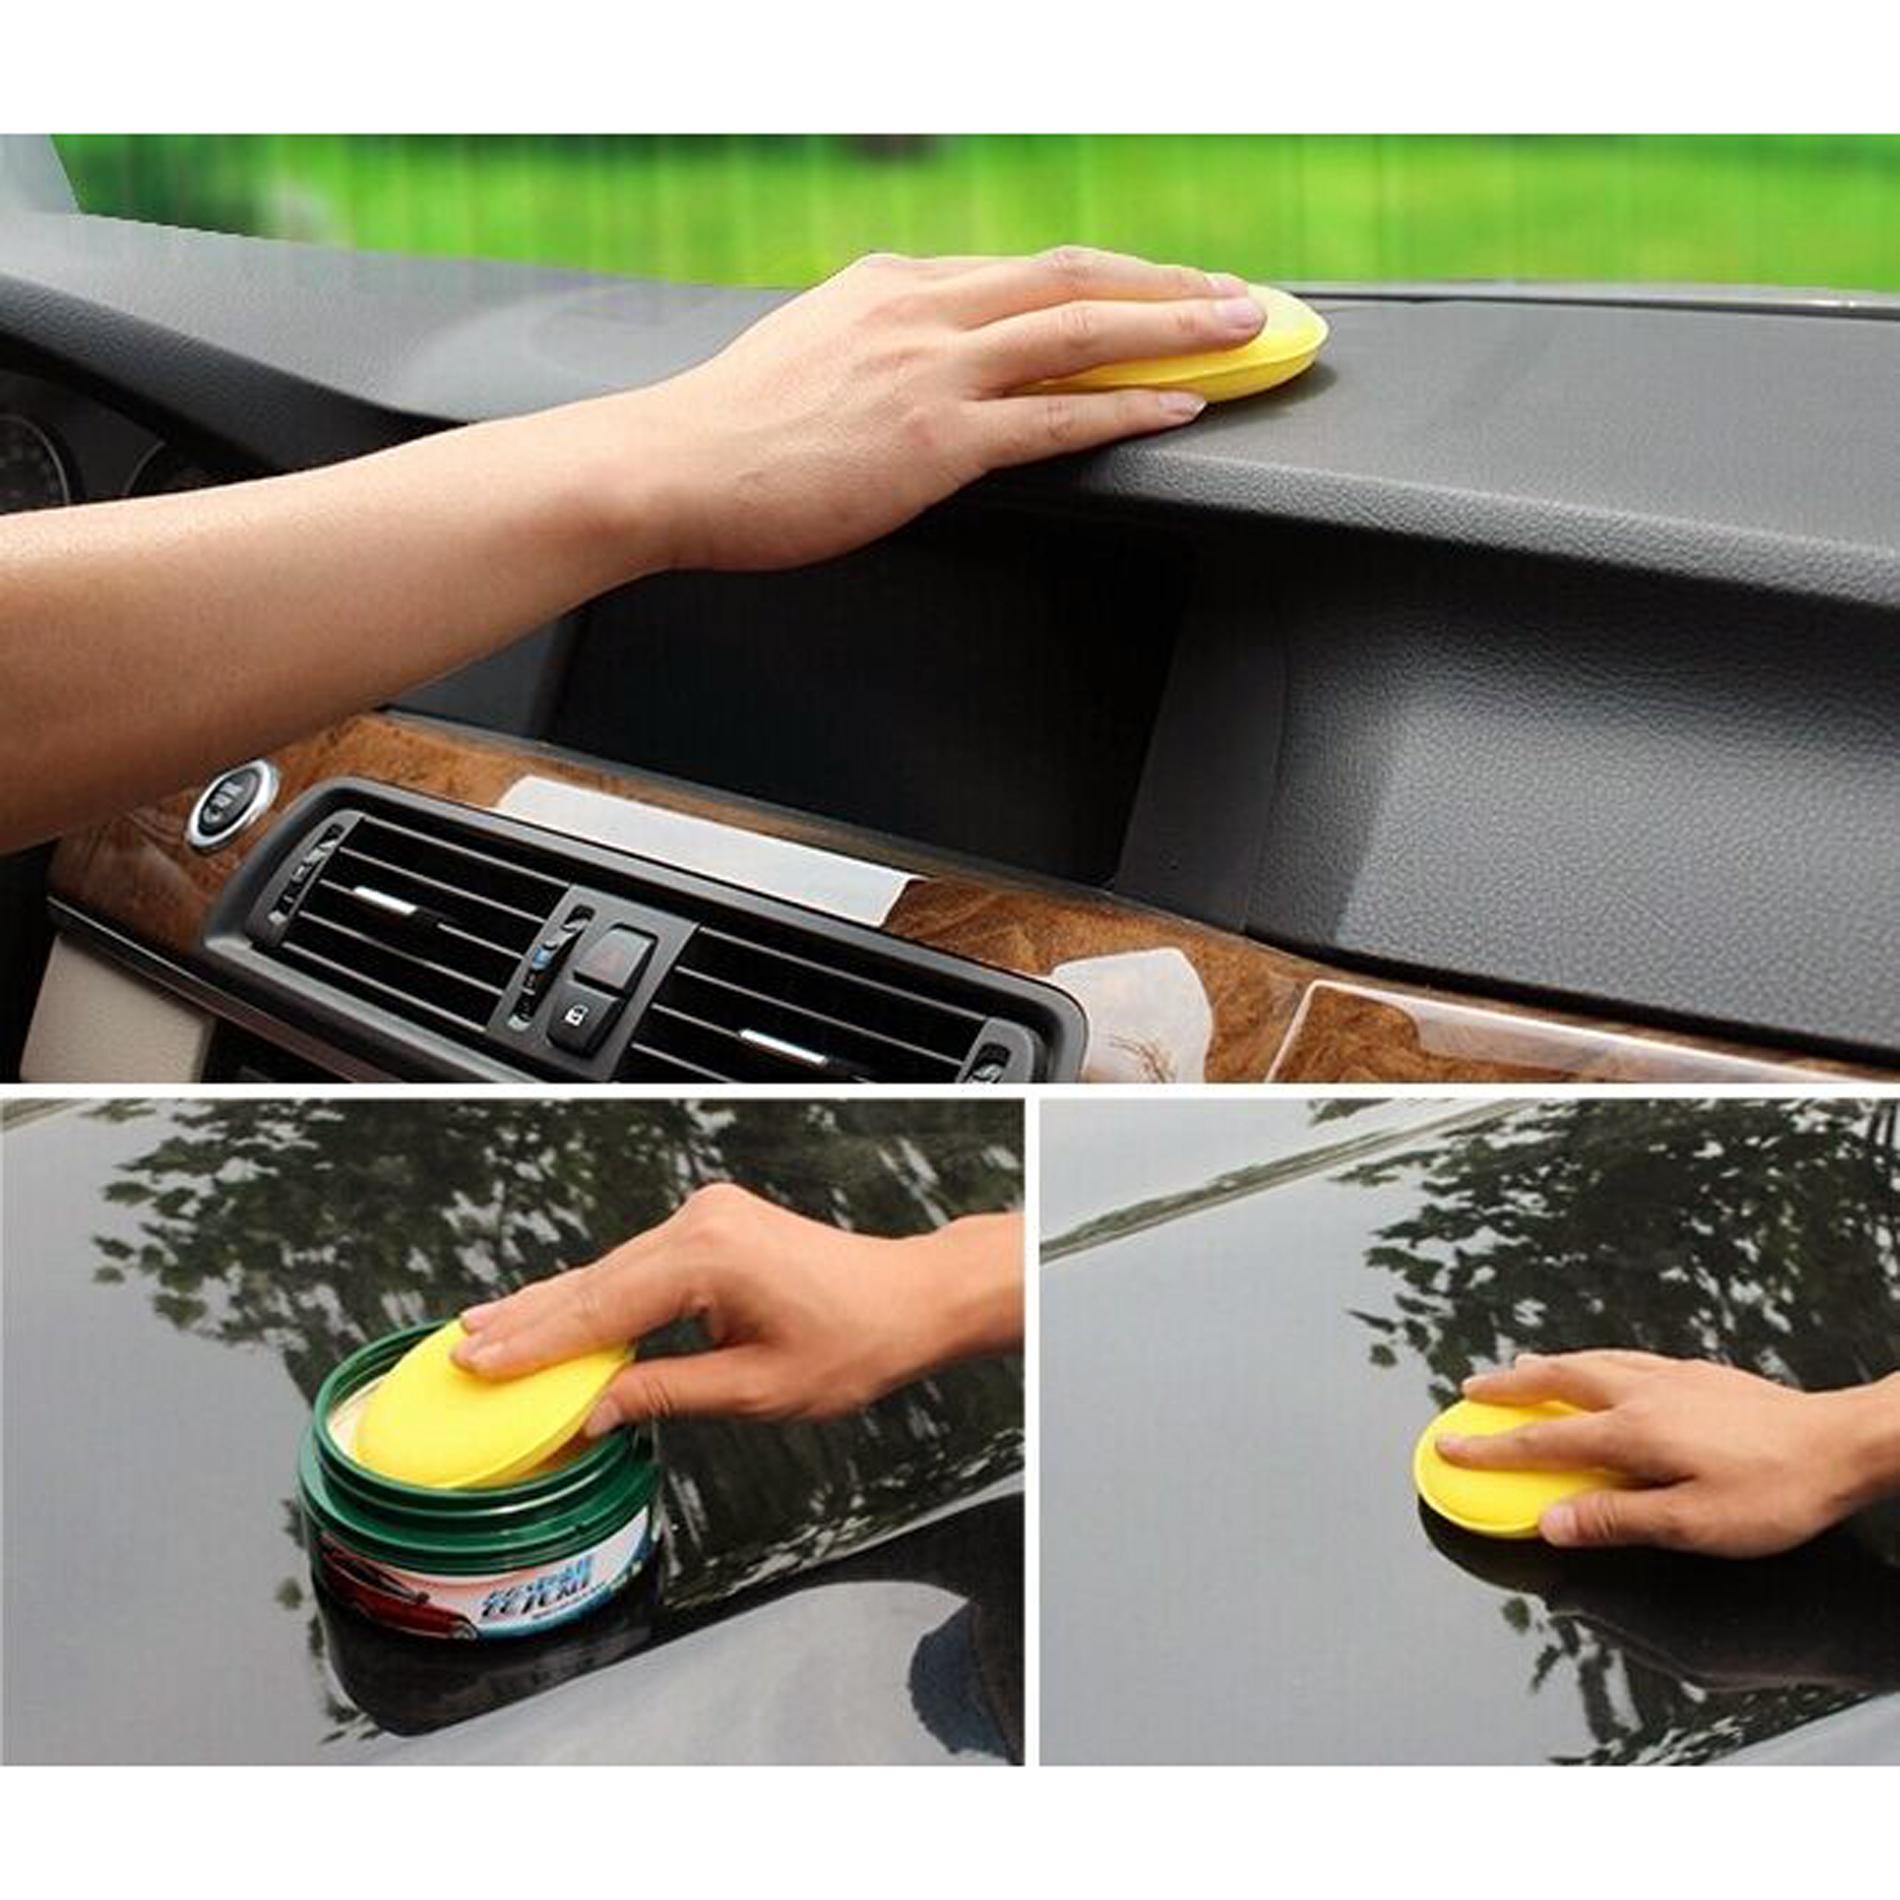 12x Car Waxing Polish Foam Sponge Wax Applicator Cleaning Pad by Unbranded